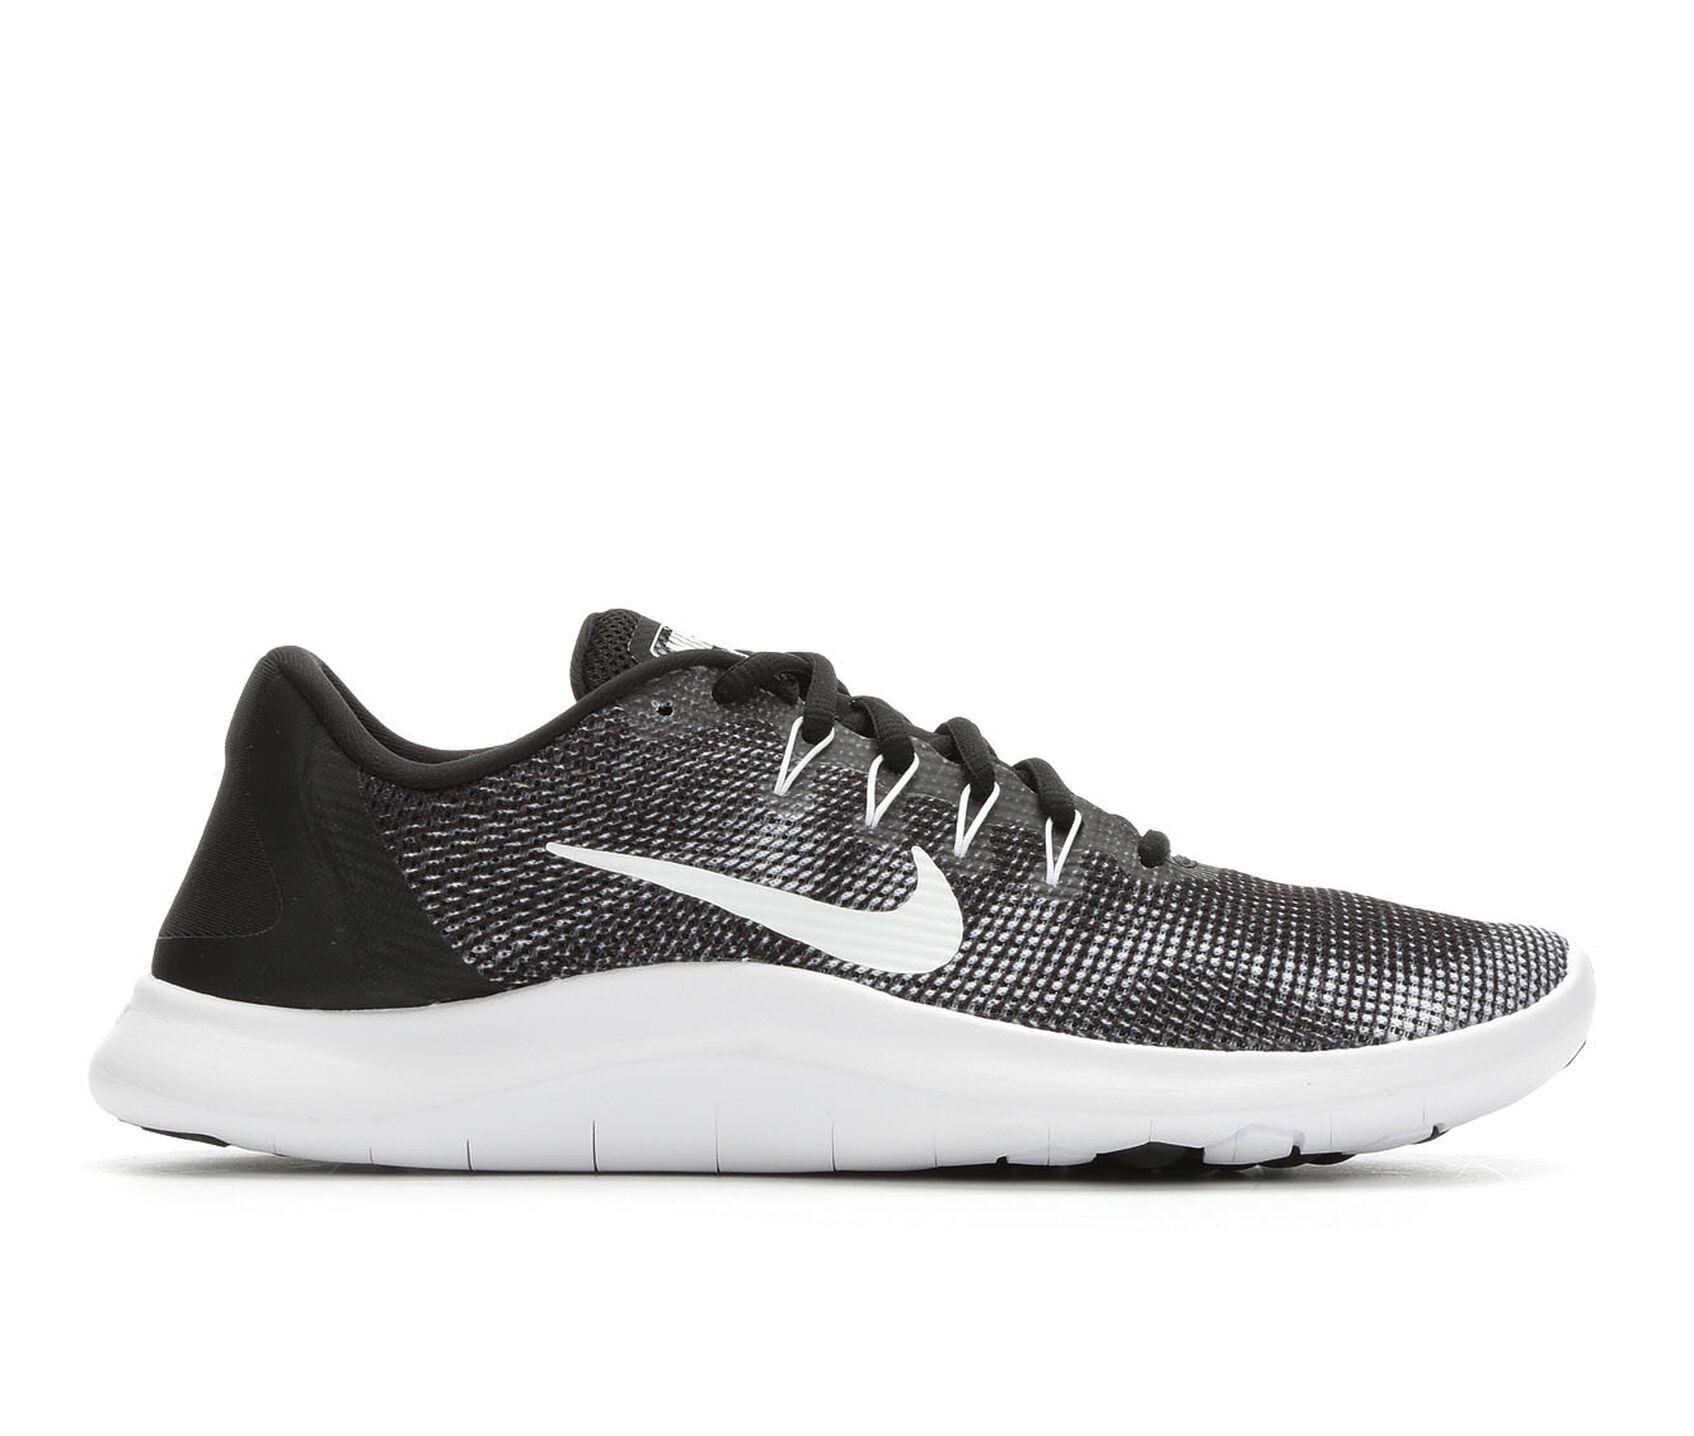 9476b06e31a5 Men  39 s Nike Flex 2018 Run Running Shoes. Previous